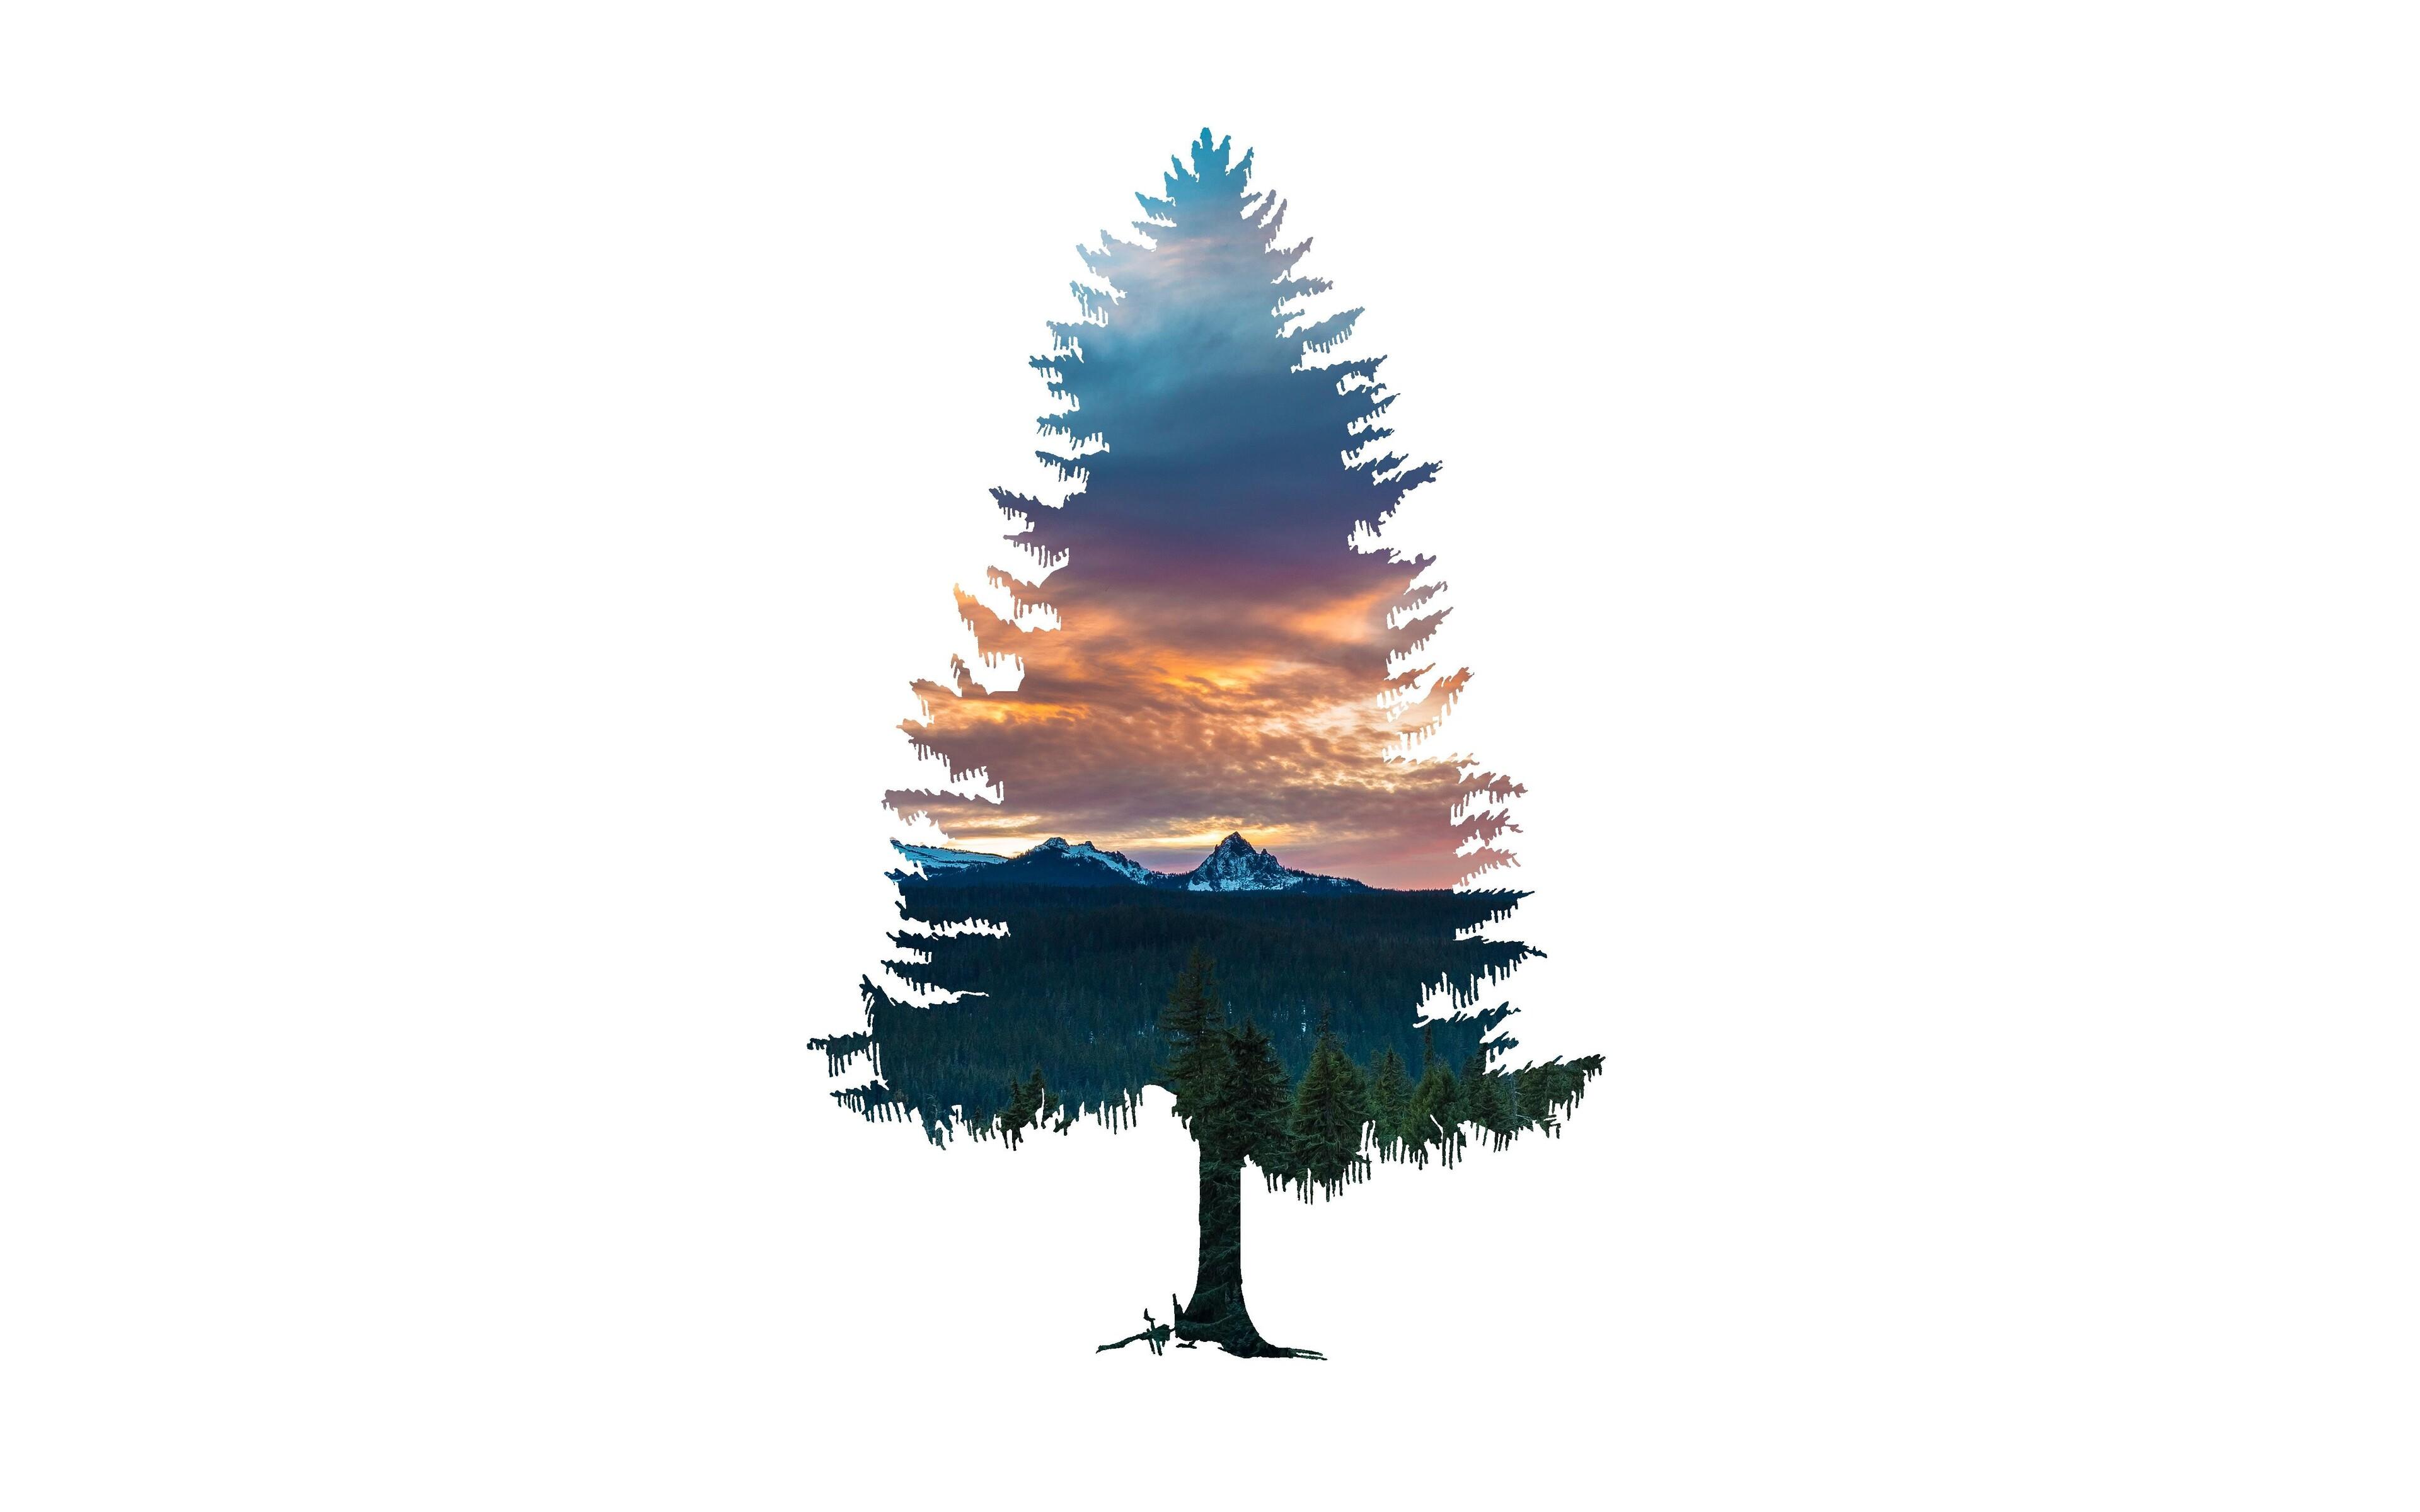 tree-abstract-nature-5k-gm.jpg